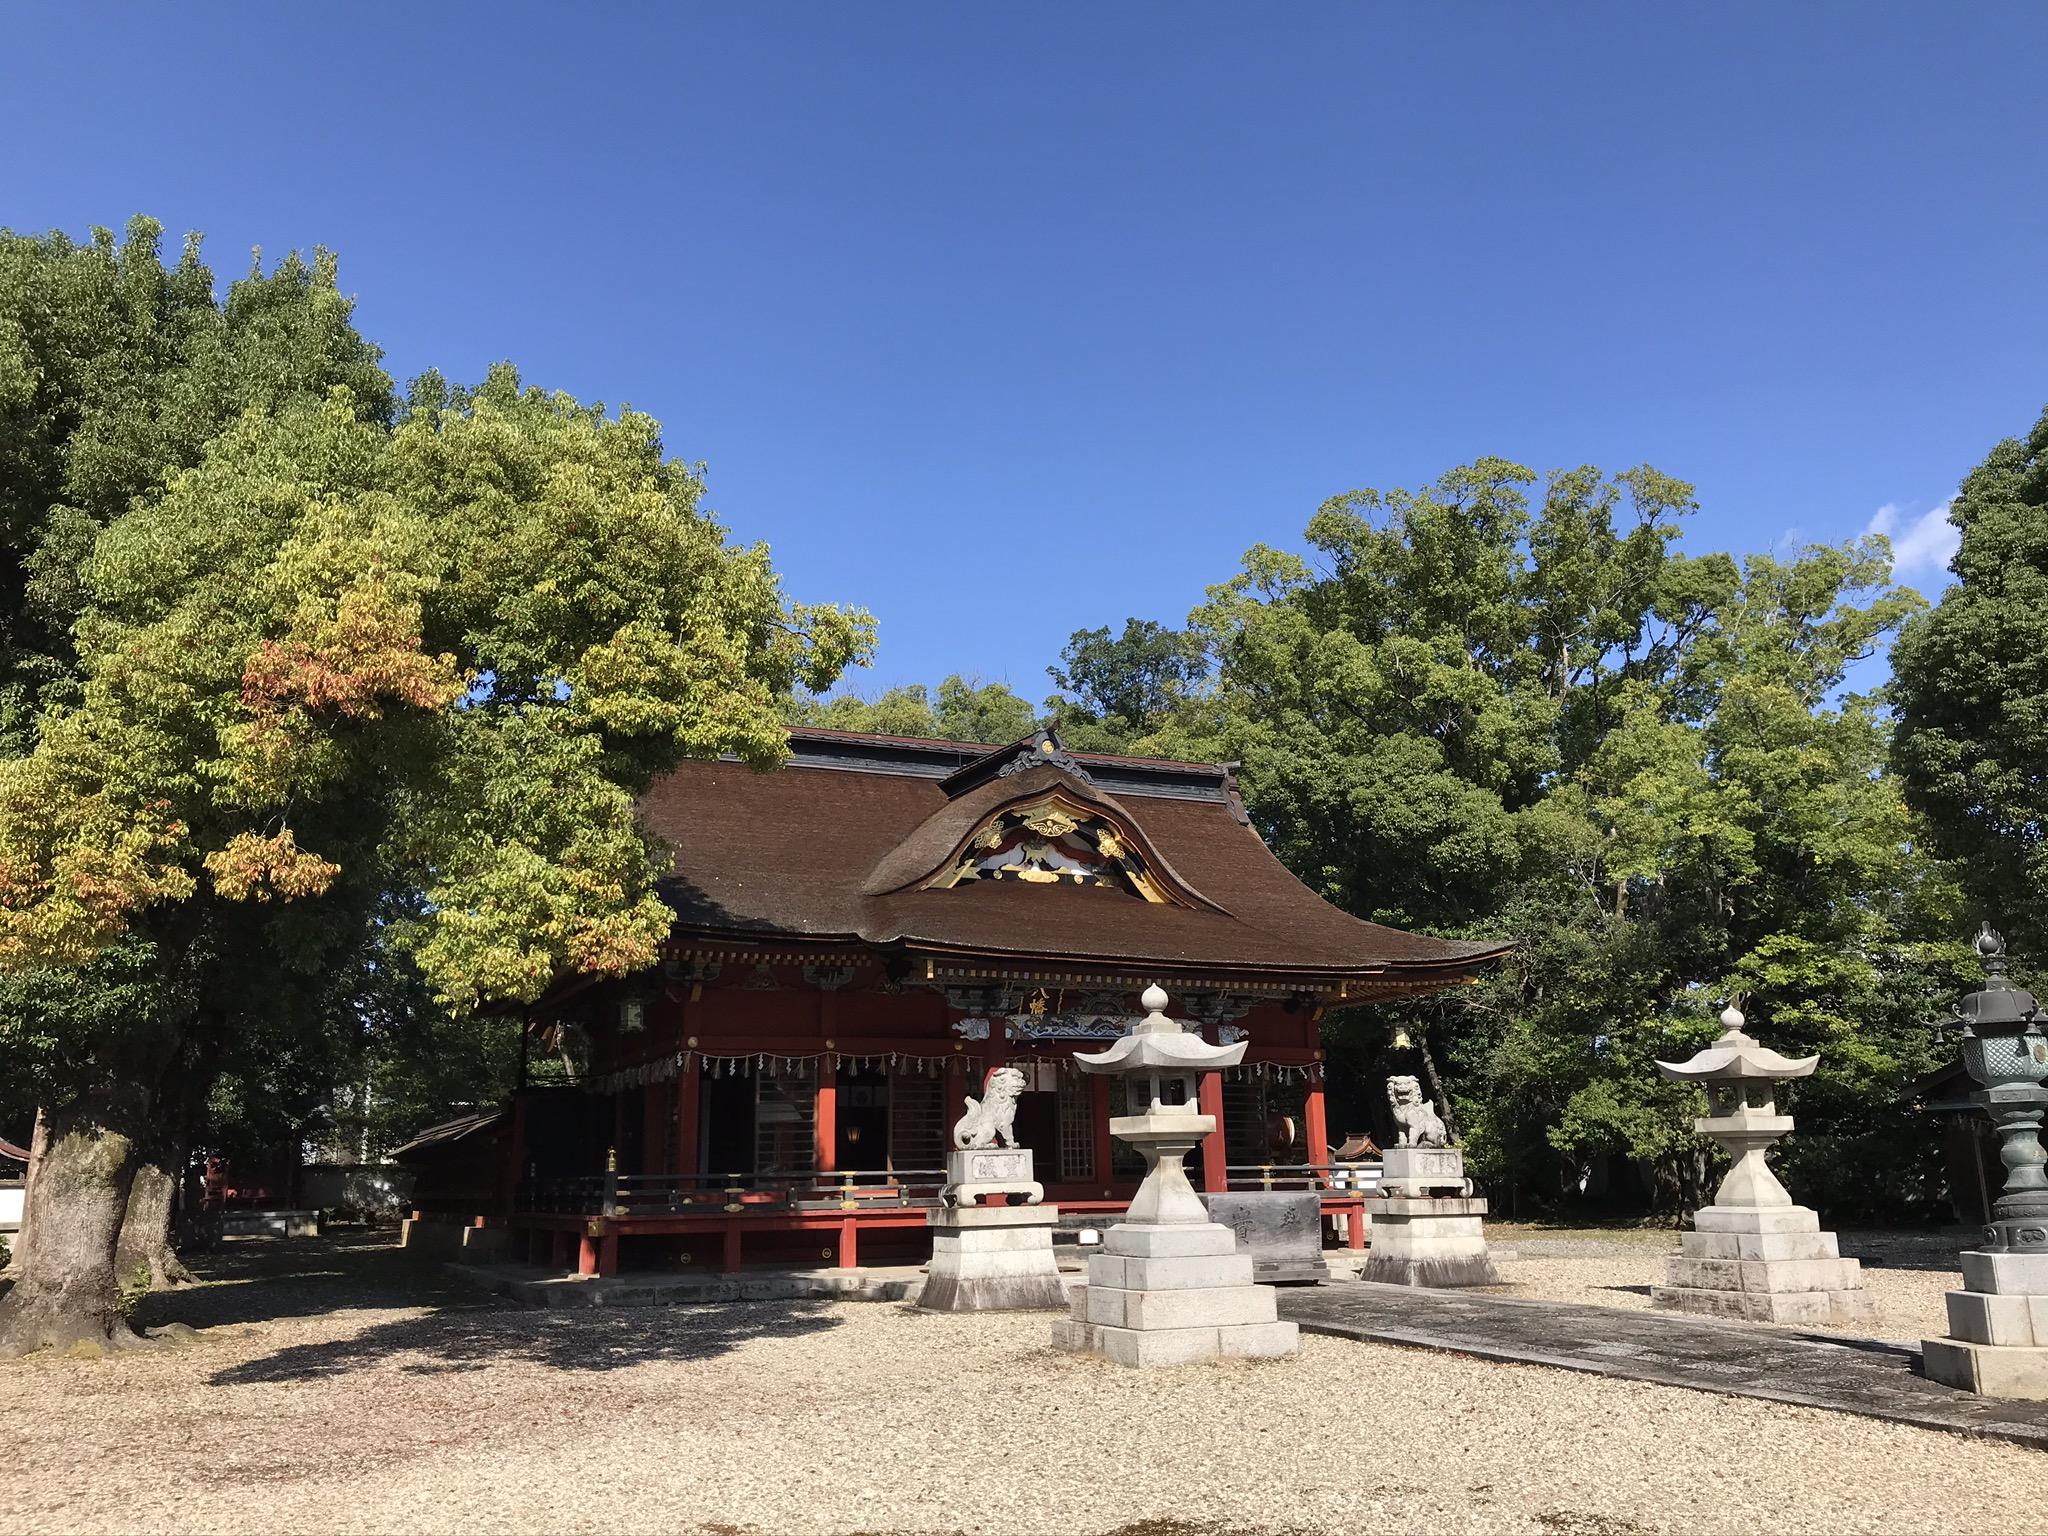 伊賀八幡宮の拝殿。